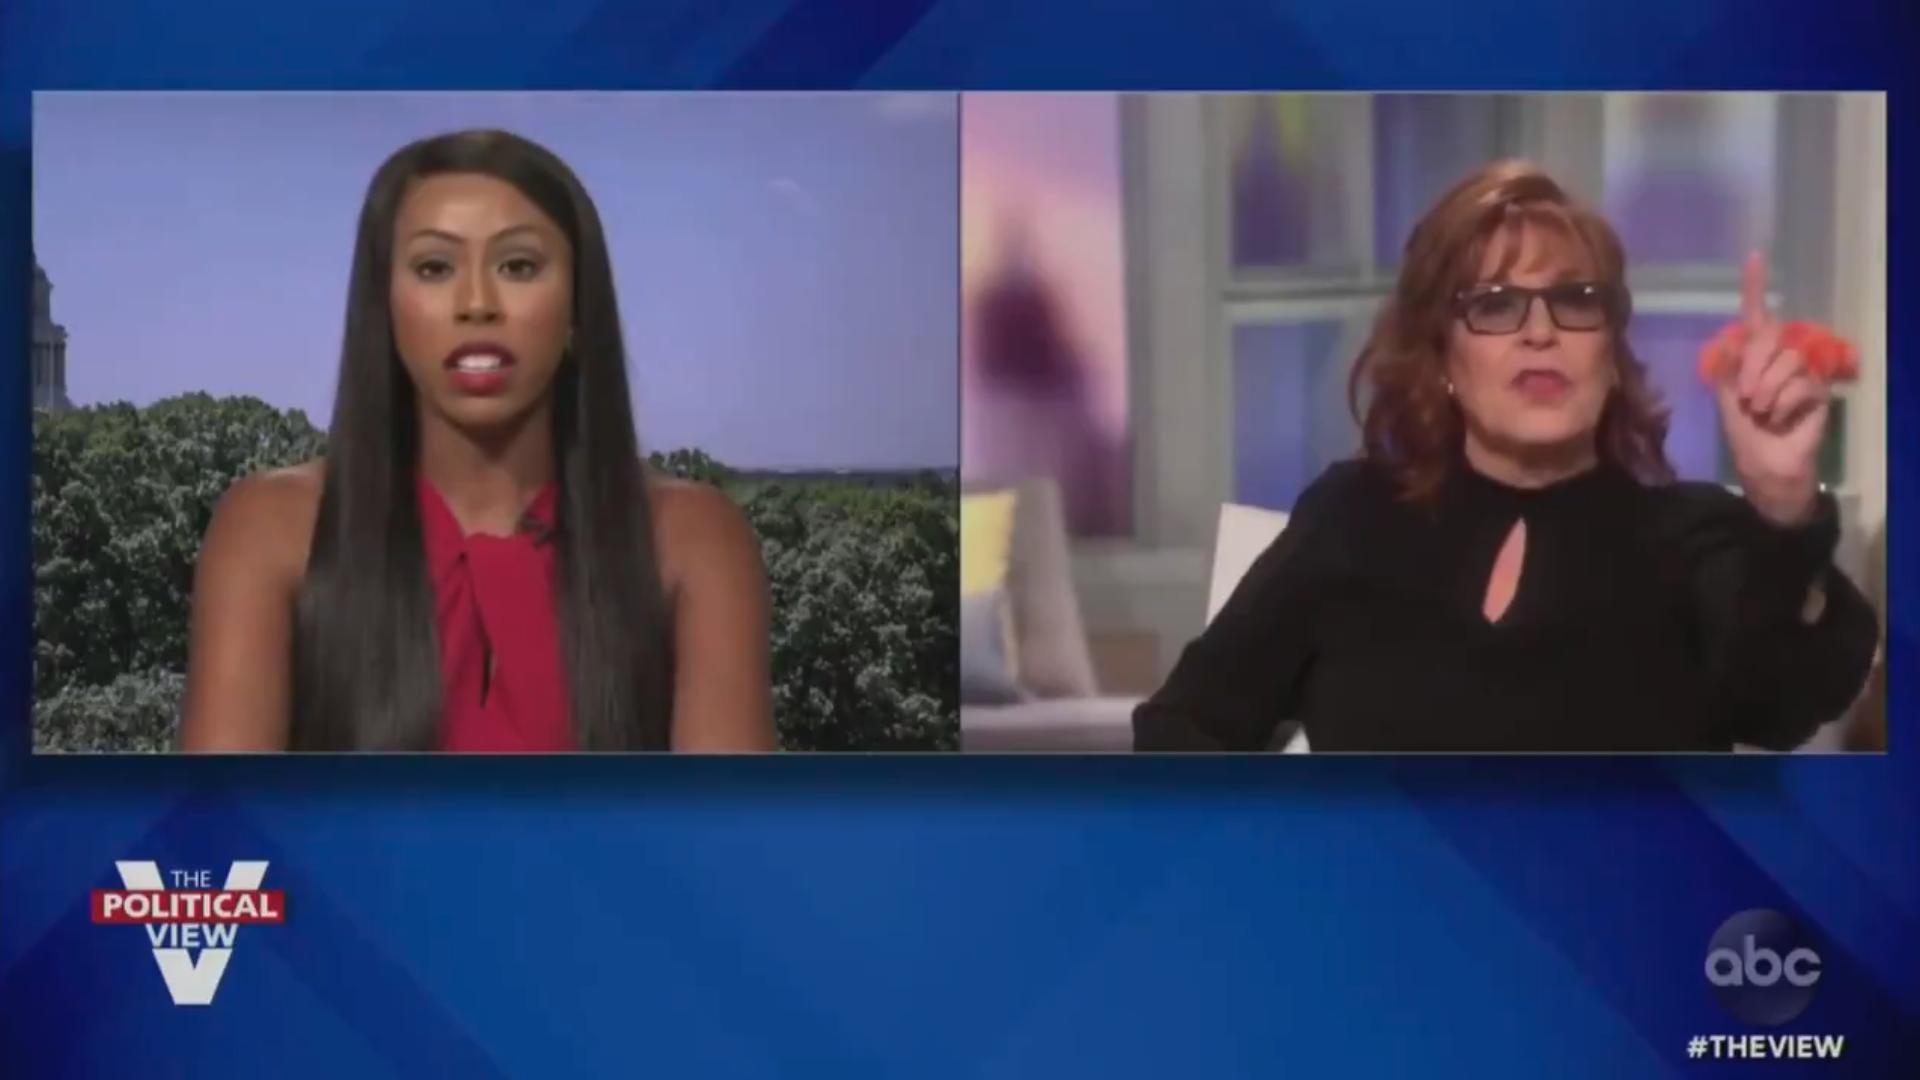 Black GOP candidate accuses 'The View's' Joy Behar of wearing blackface